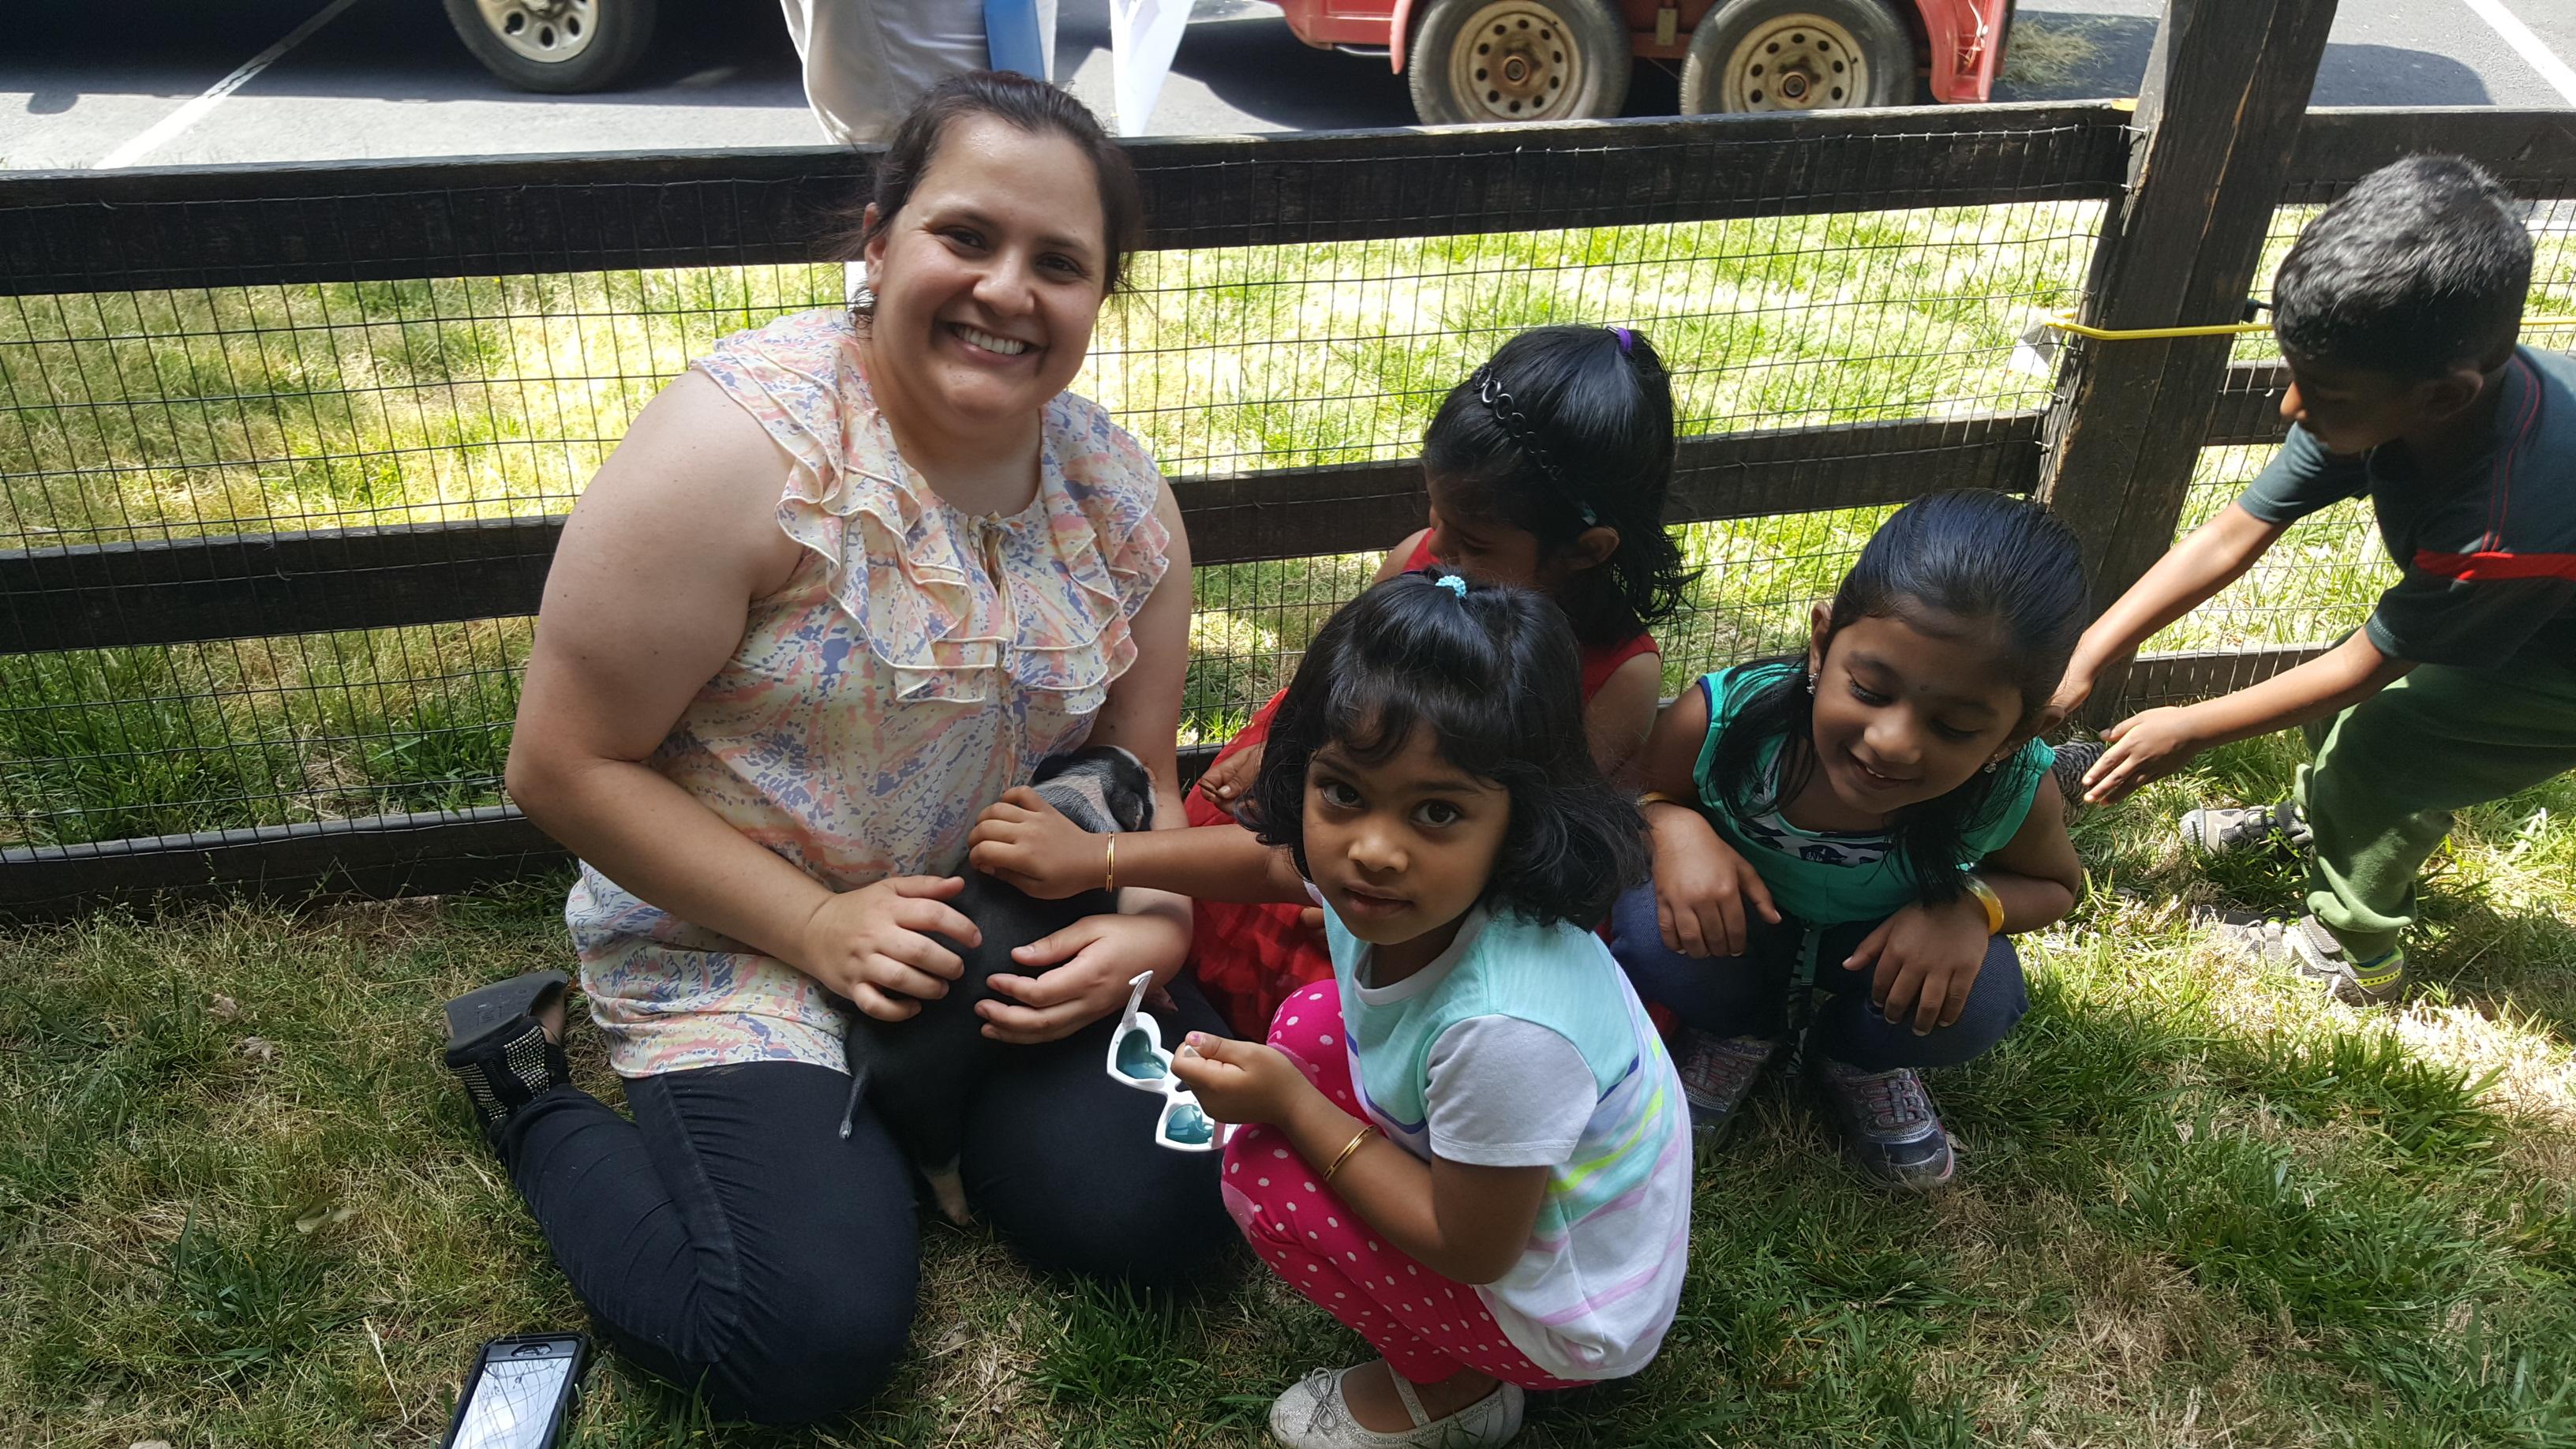 NAPS 2018 Petting Zoo